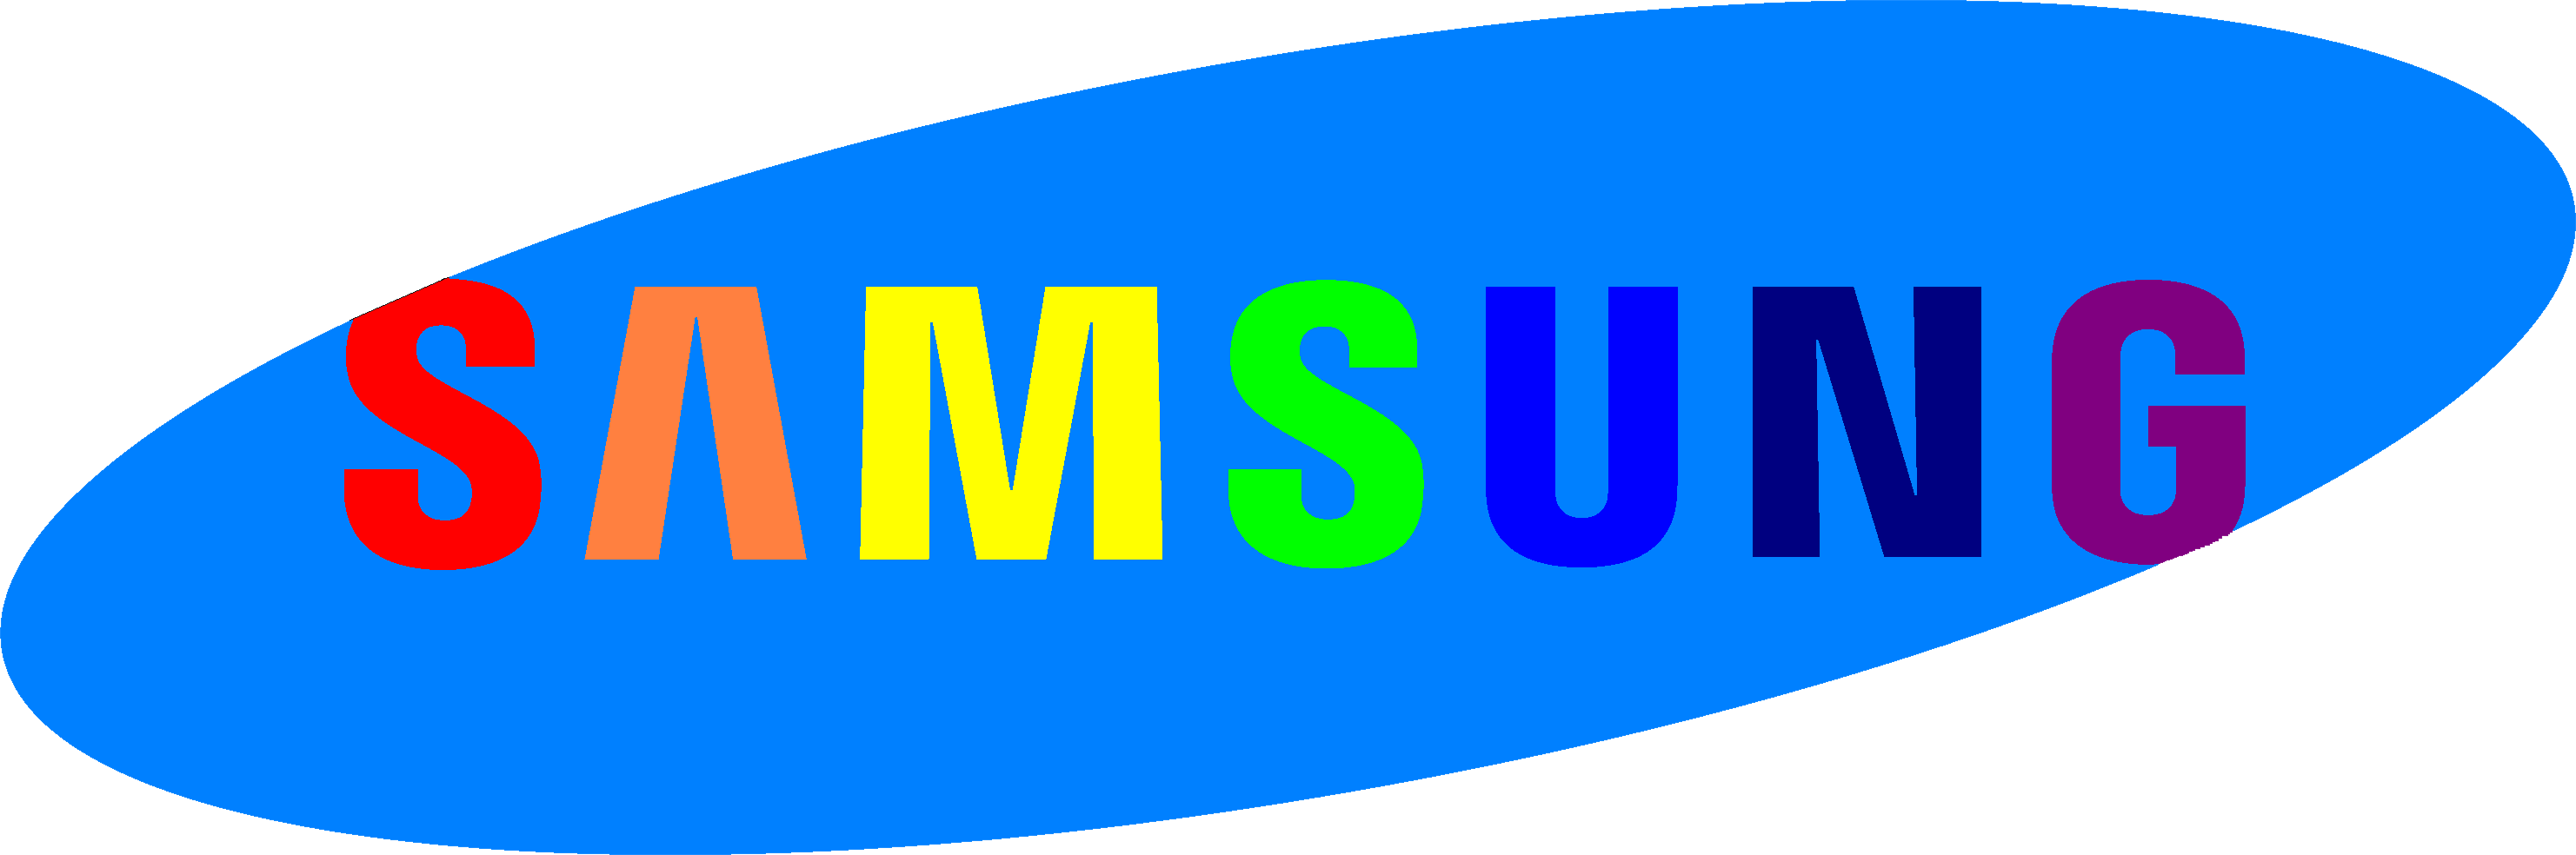 Samsung Logo PNG - 33069